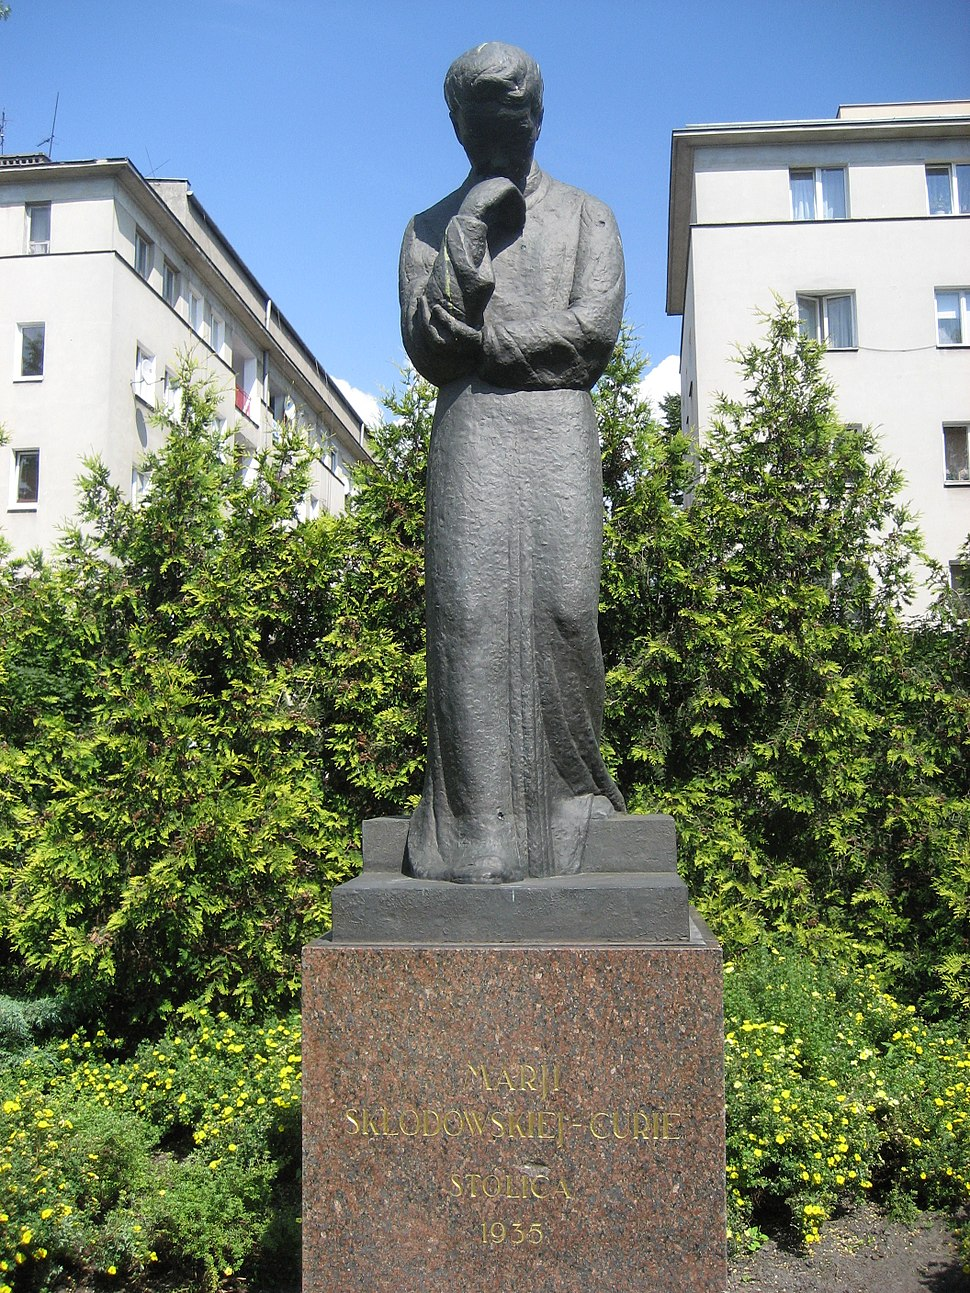 Sklodowska-Curie statue, Warsaw